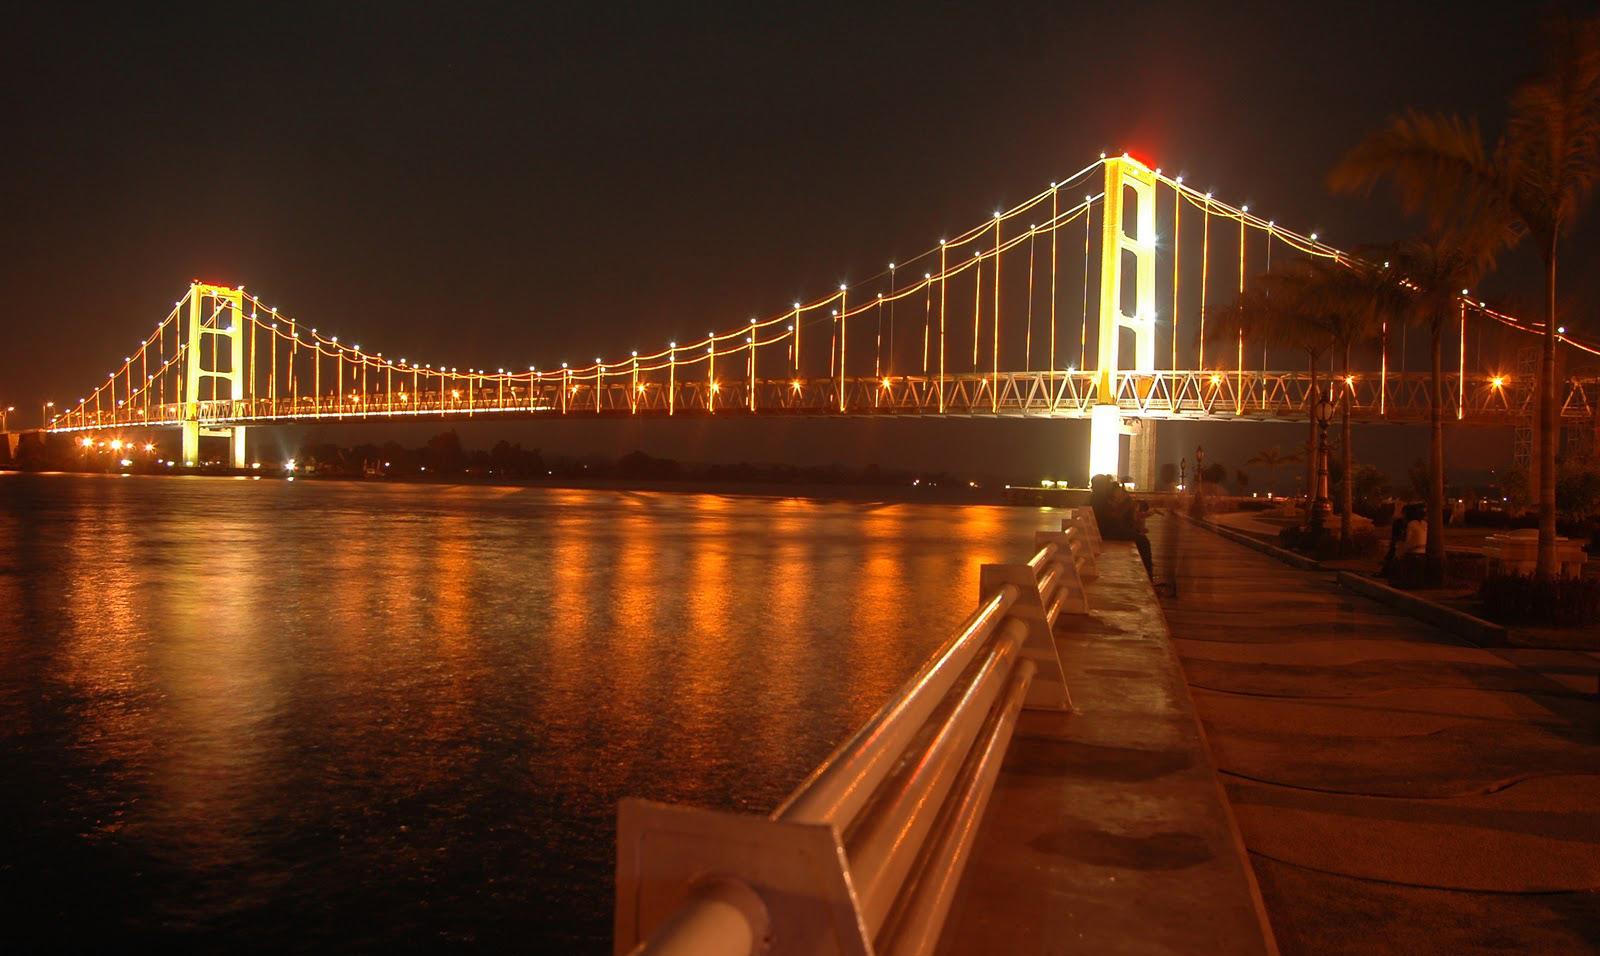 3 Jembatan Mahakam turisindo Ary Anshorie